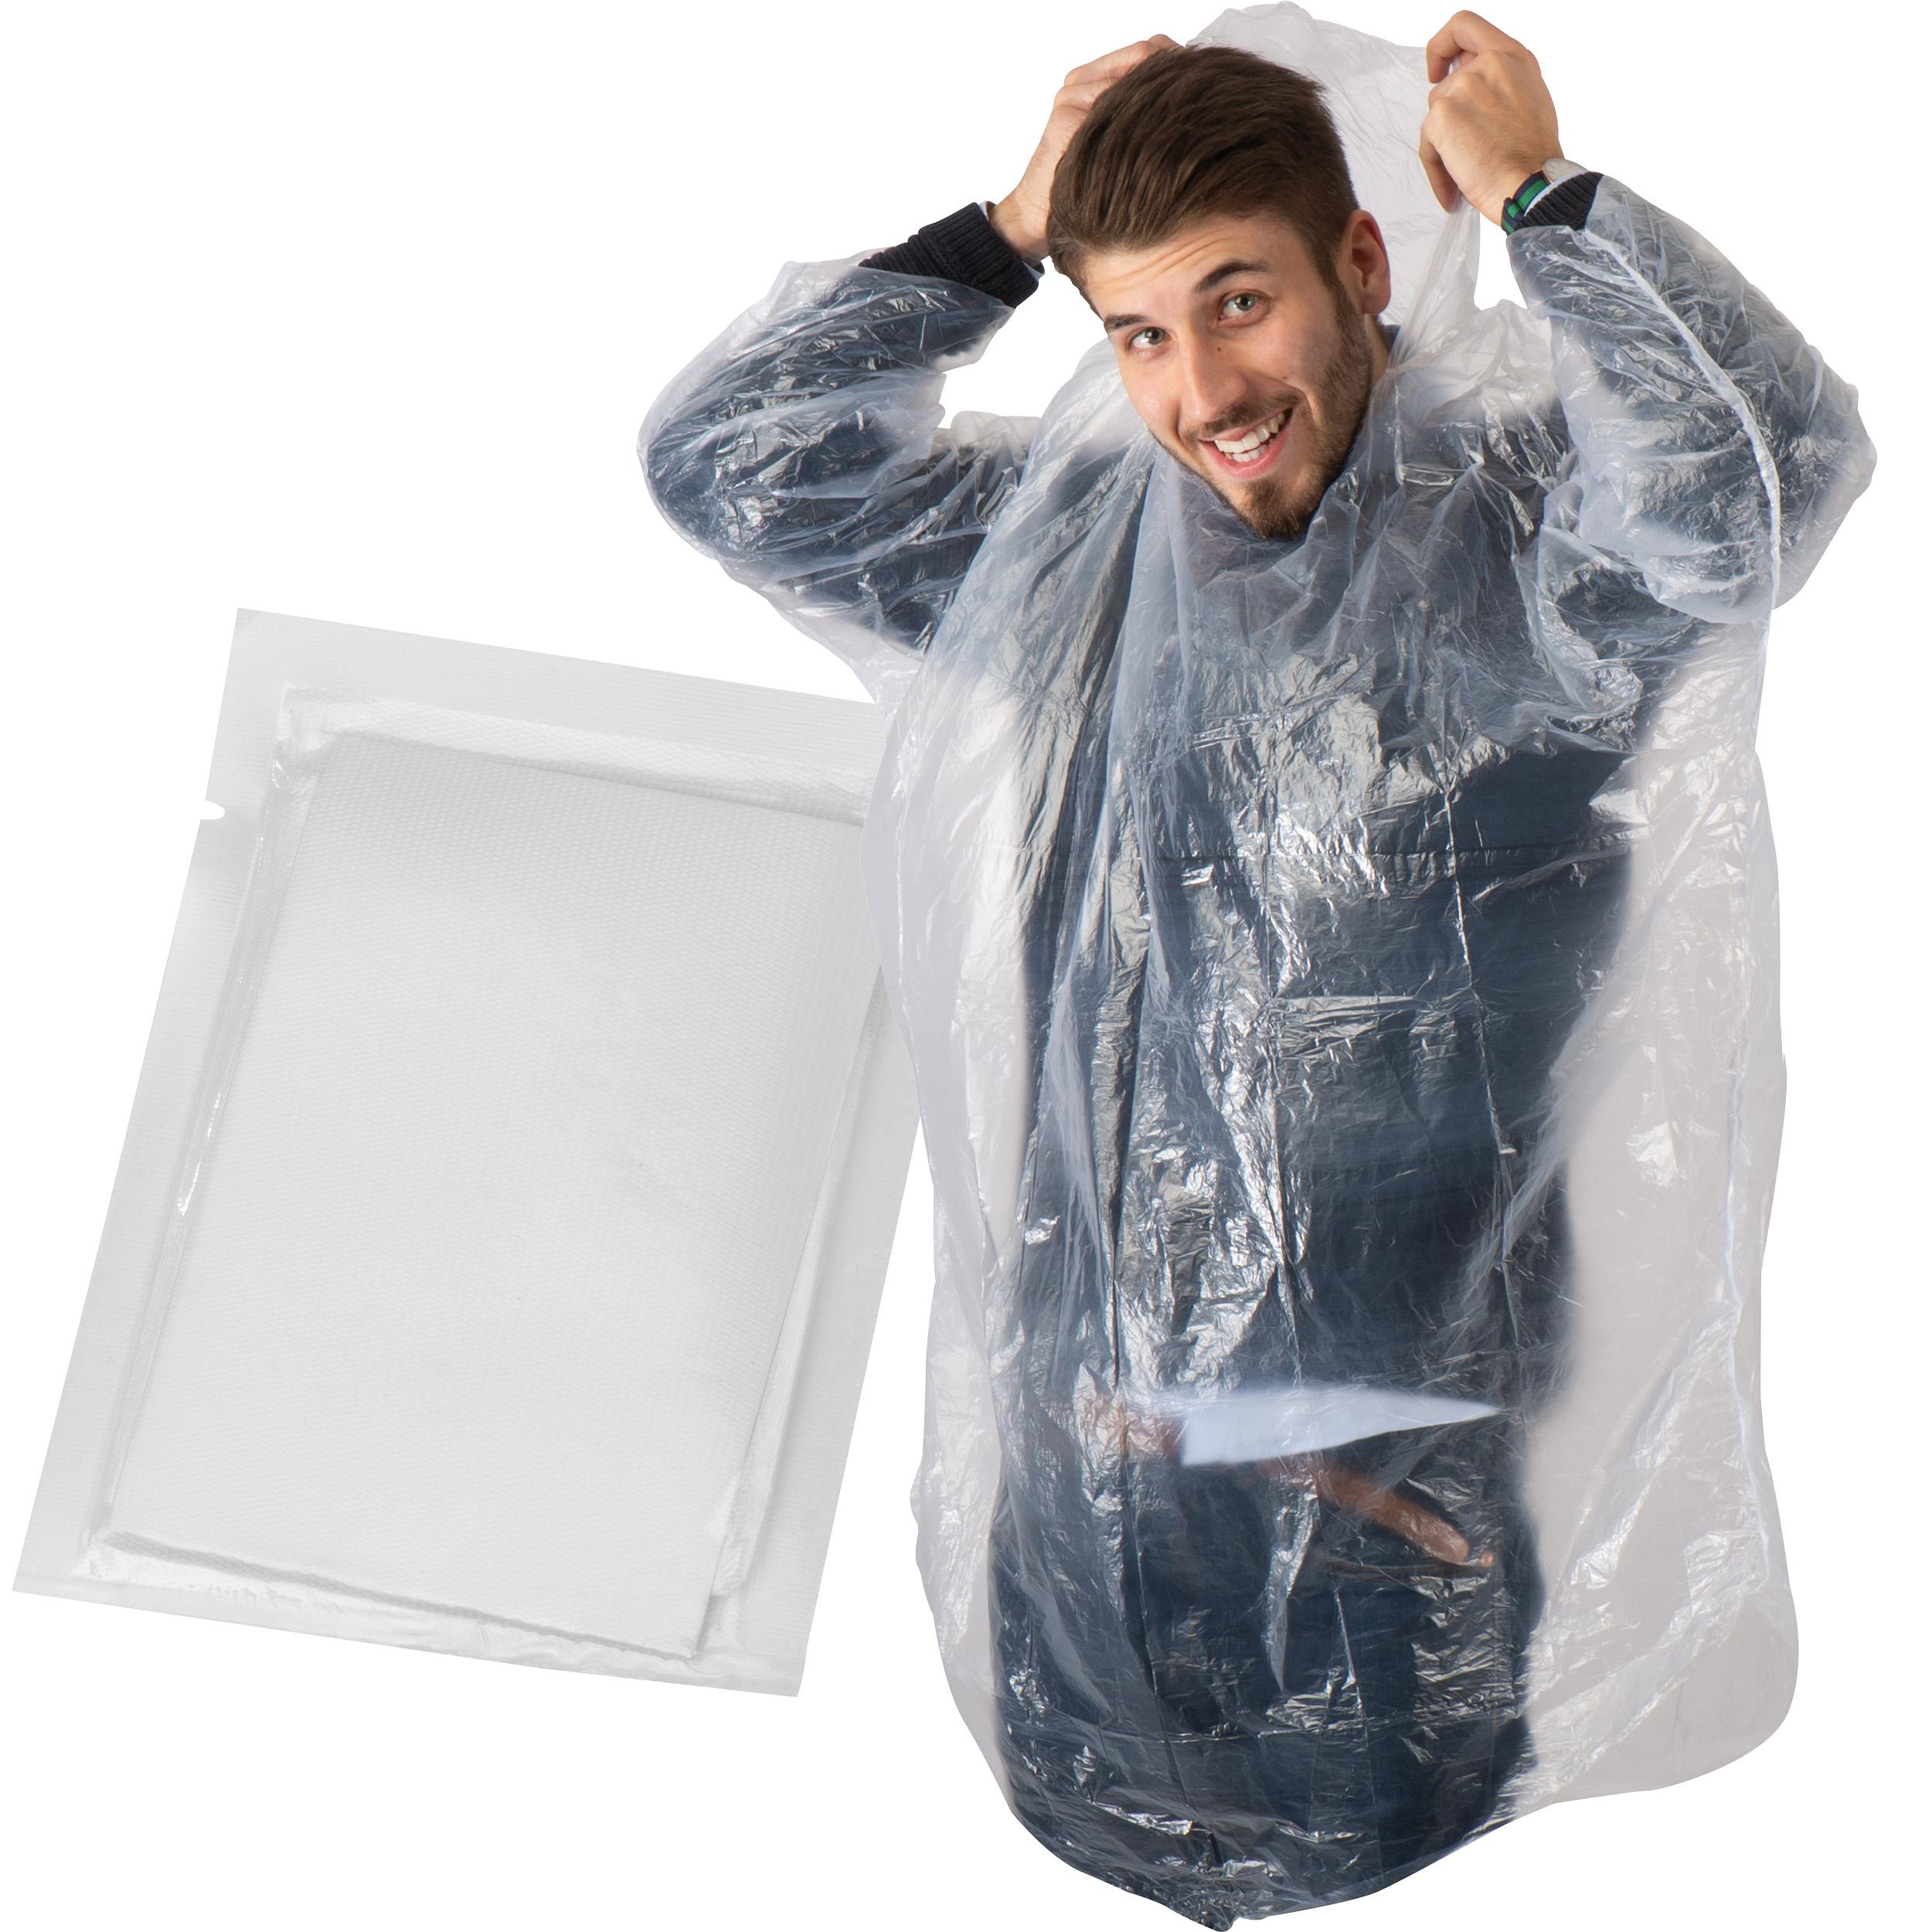 Phthalatefreier, transparenter Not-Poncho